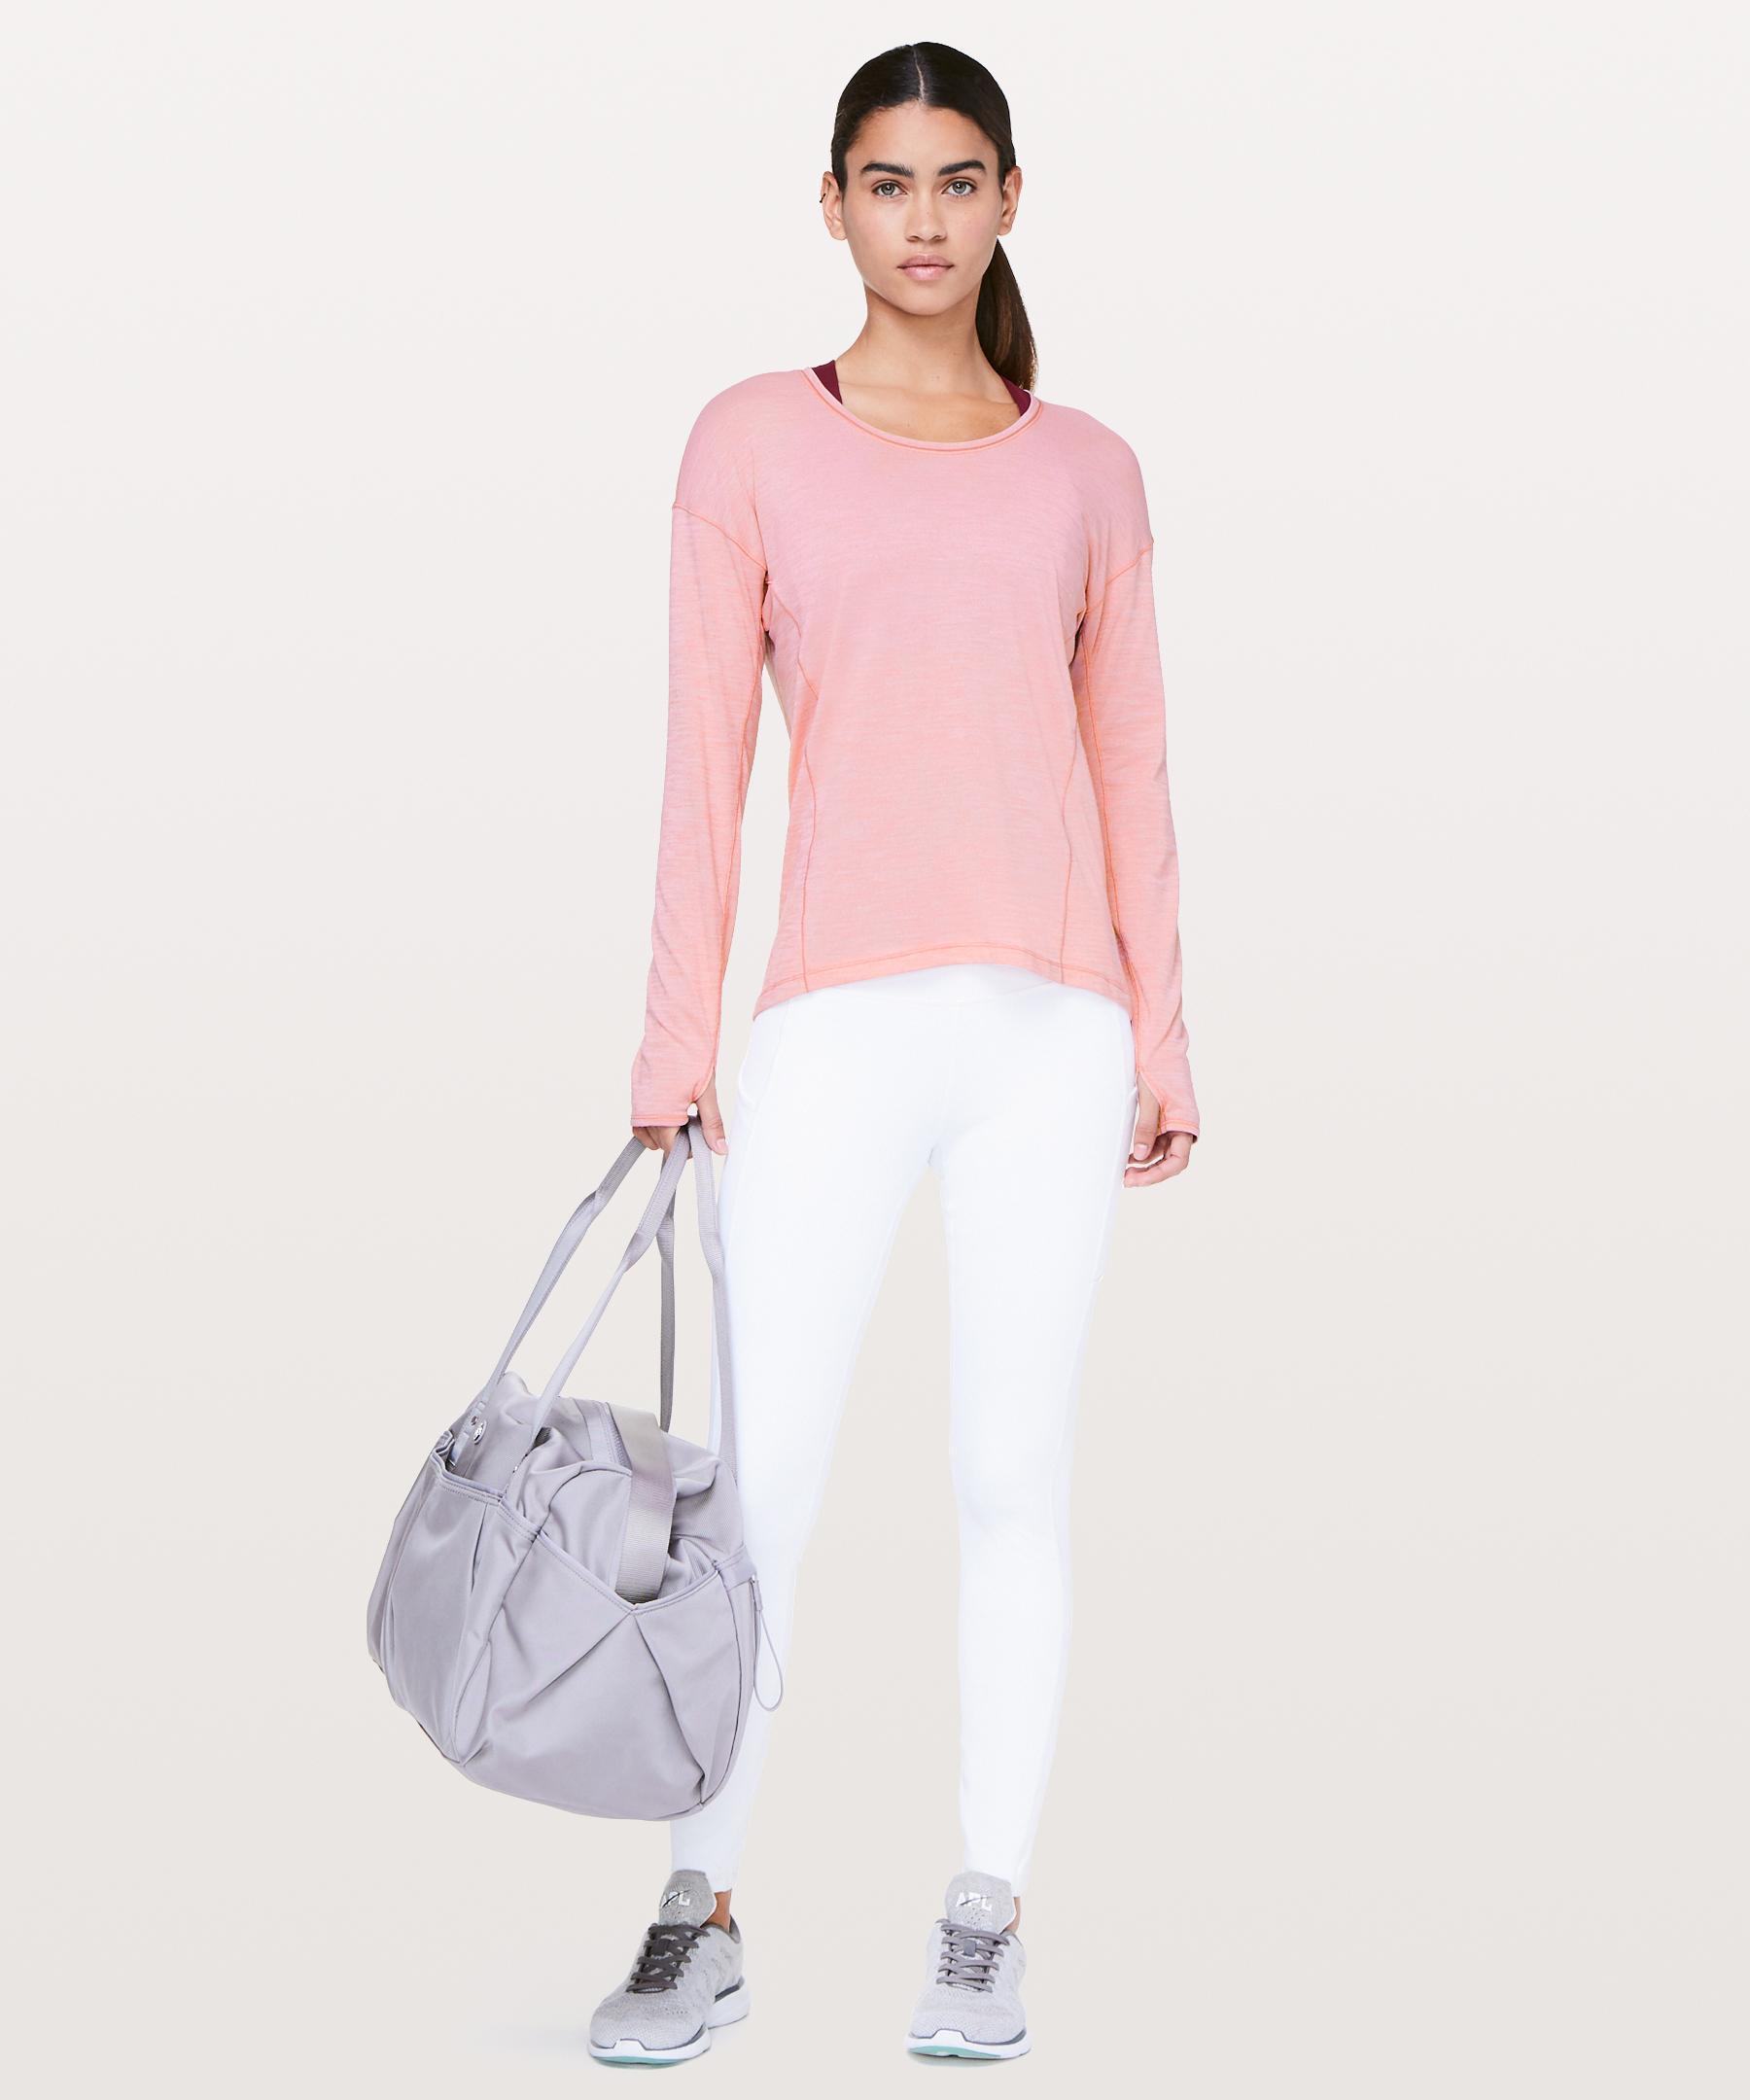 35ff12d325 lululemon athletica Sweat Embrace Long Sleeve in Pink - Lyst